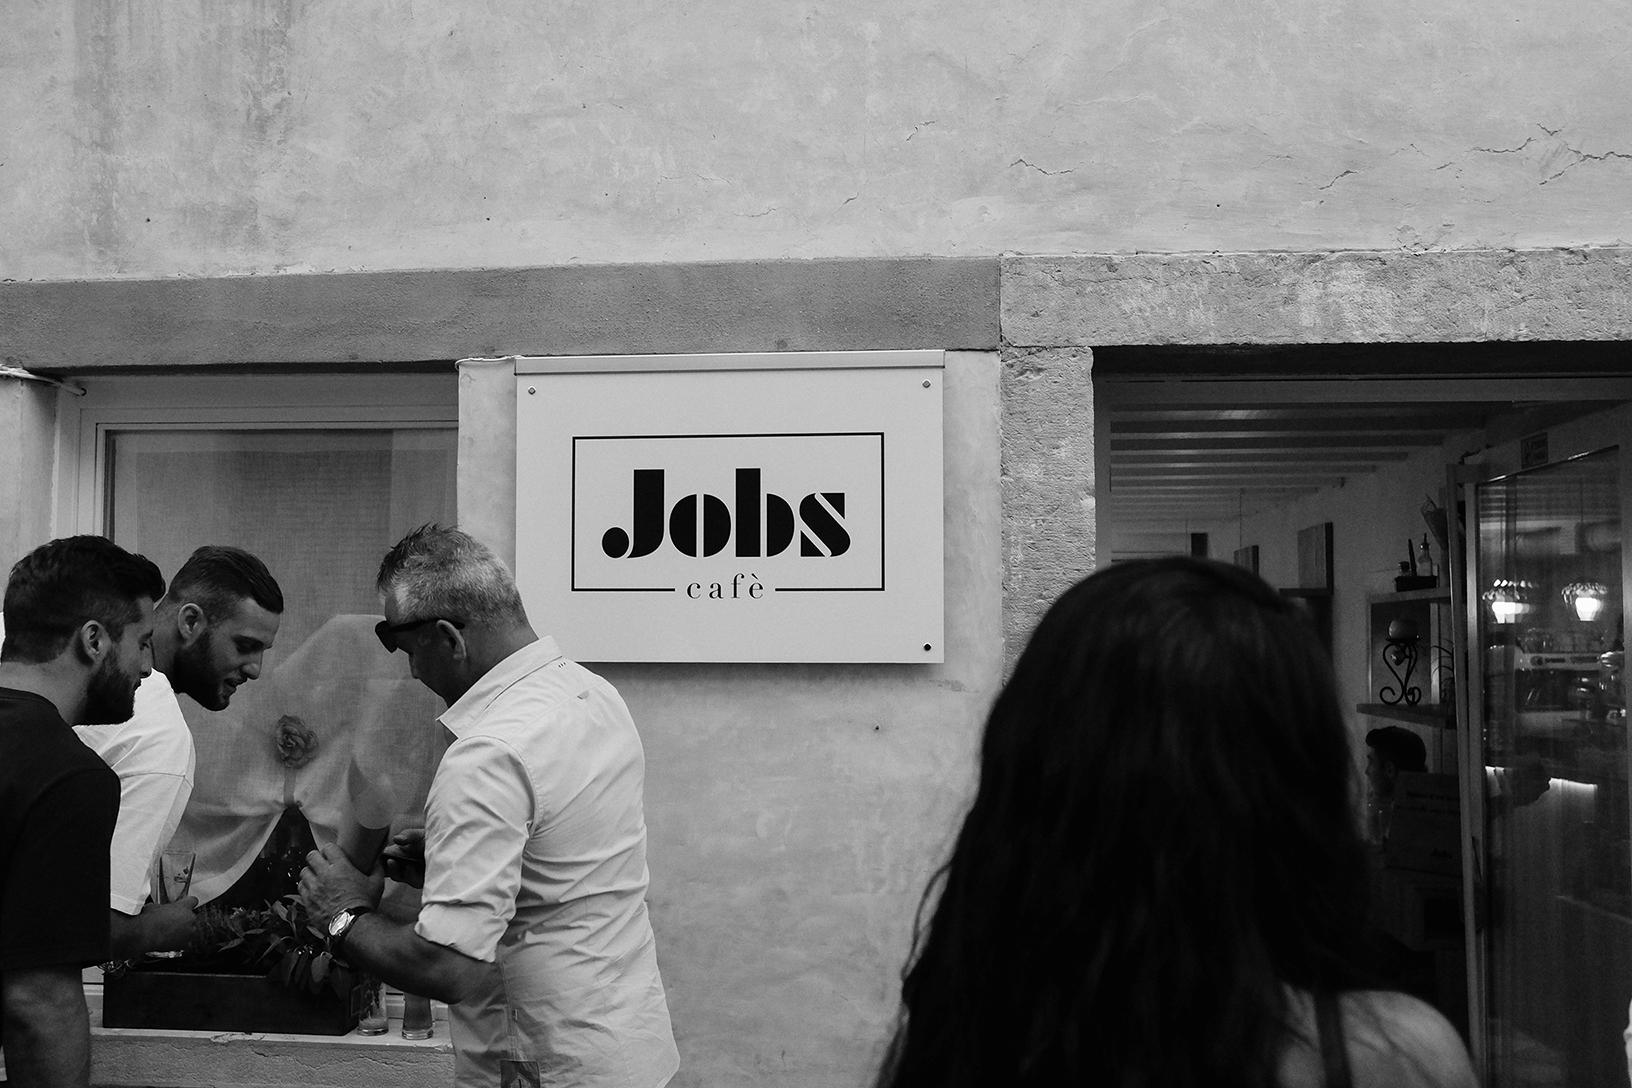 Jobs-logo entrance.jpg